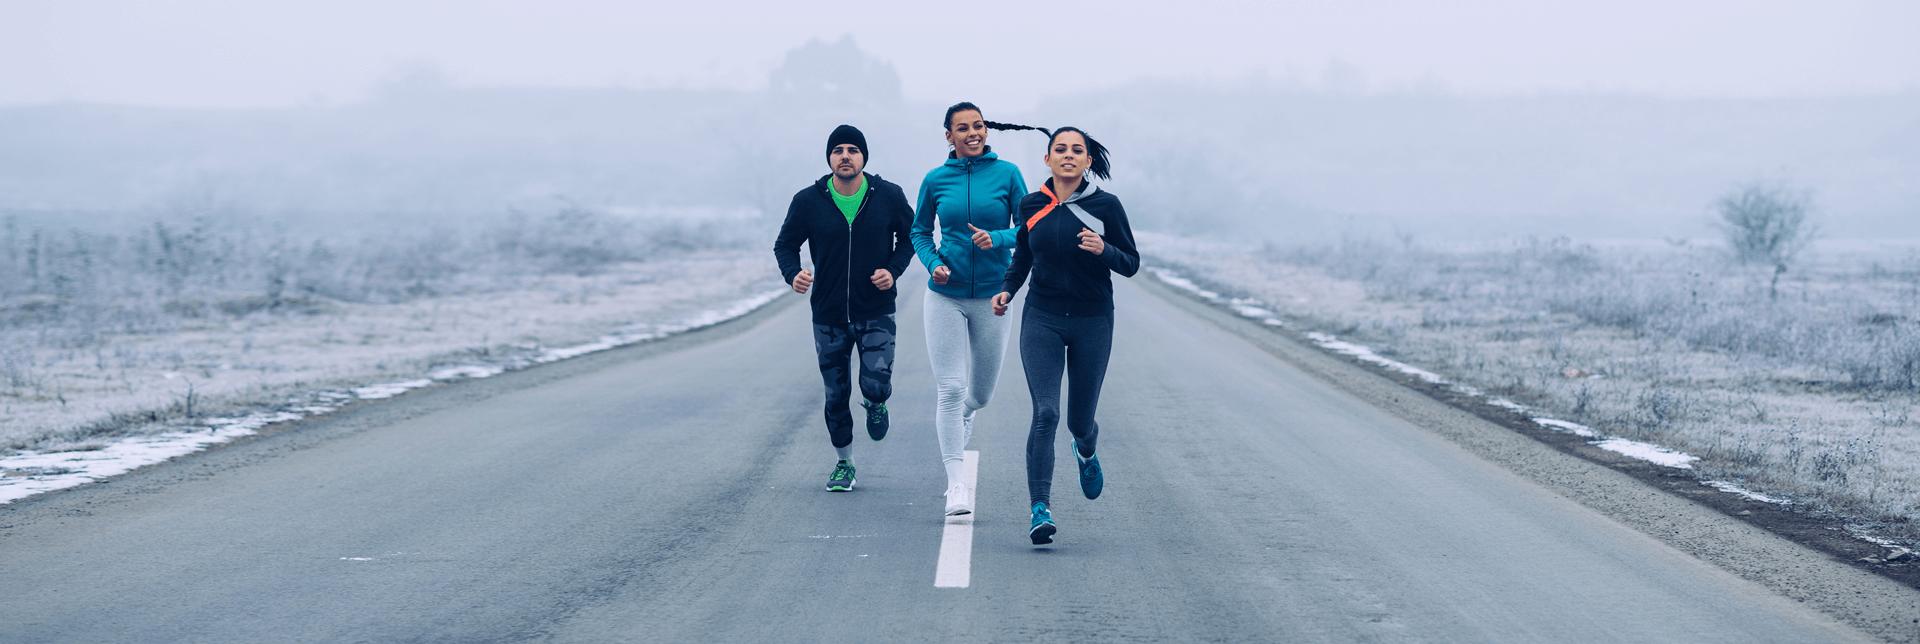 Ladies and men enjoying running outdoors in winter